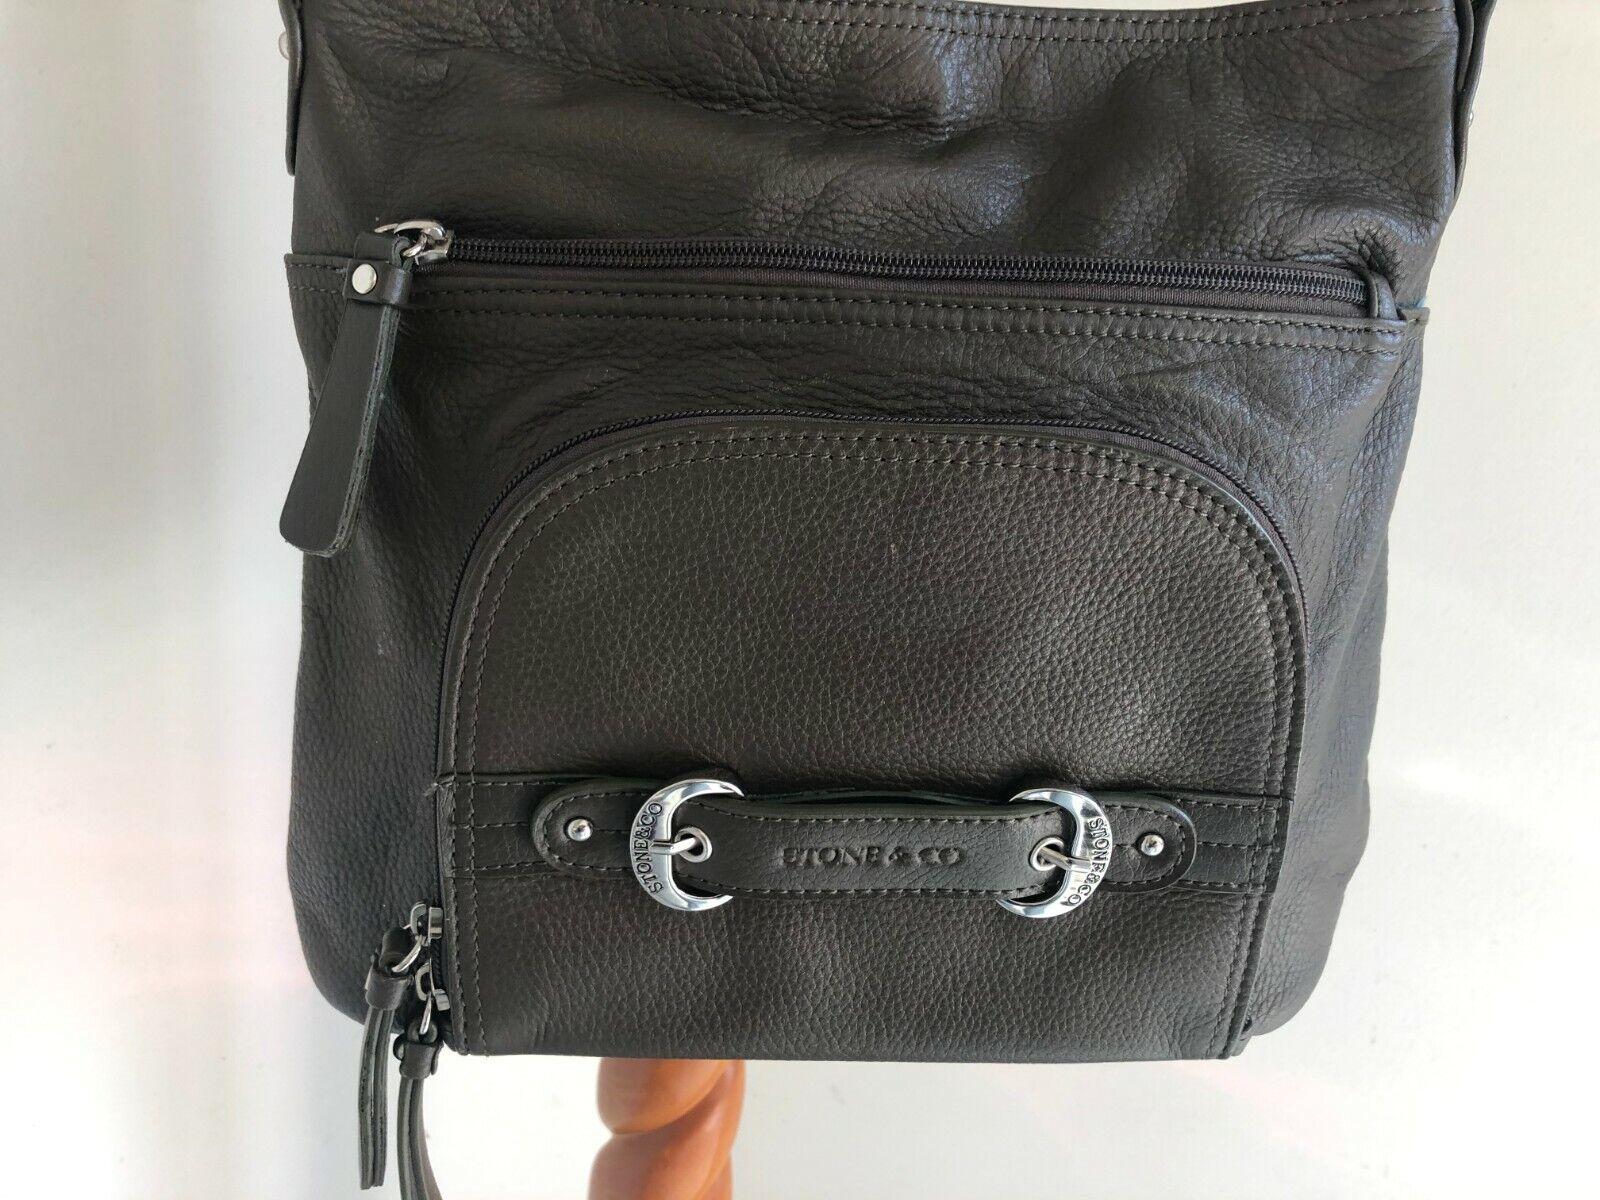 STONE & CO LEATHER SHOULDER BAG PURSE BROWN EXCELLENT